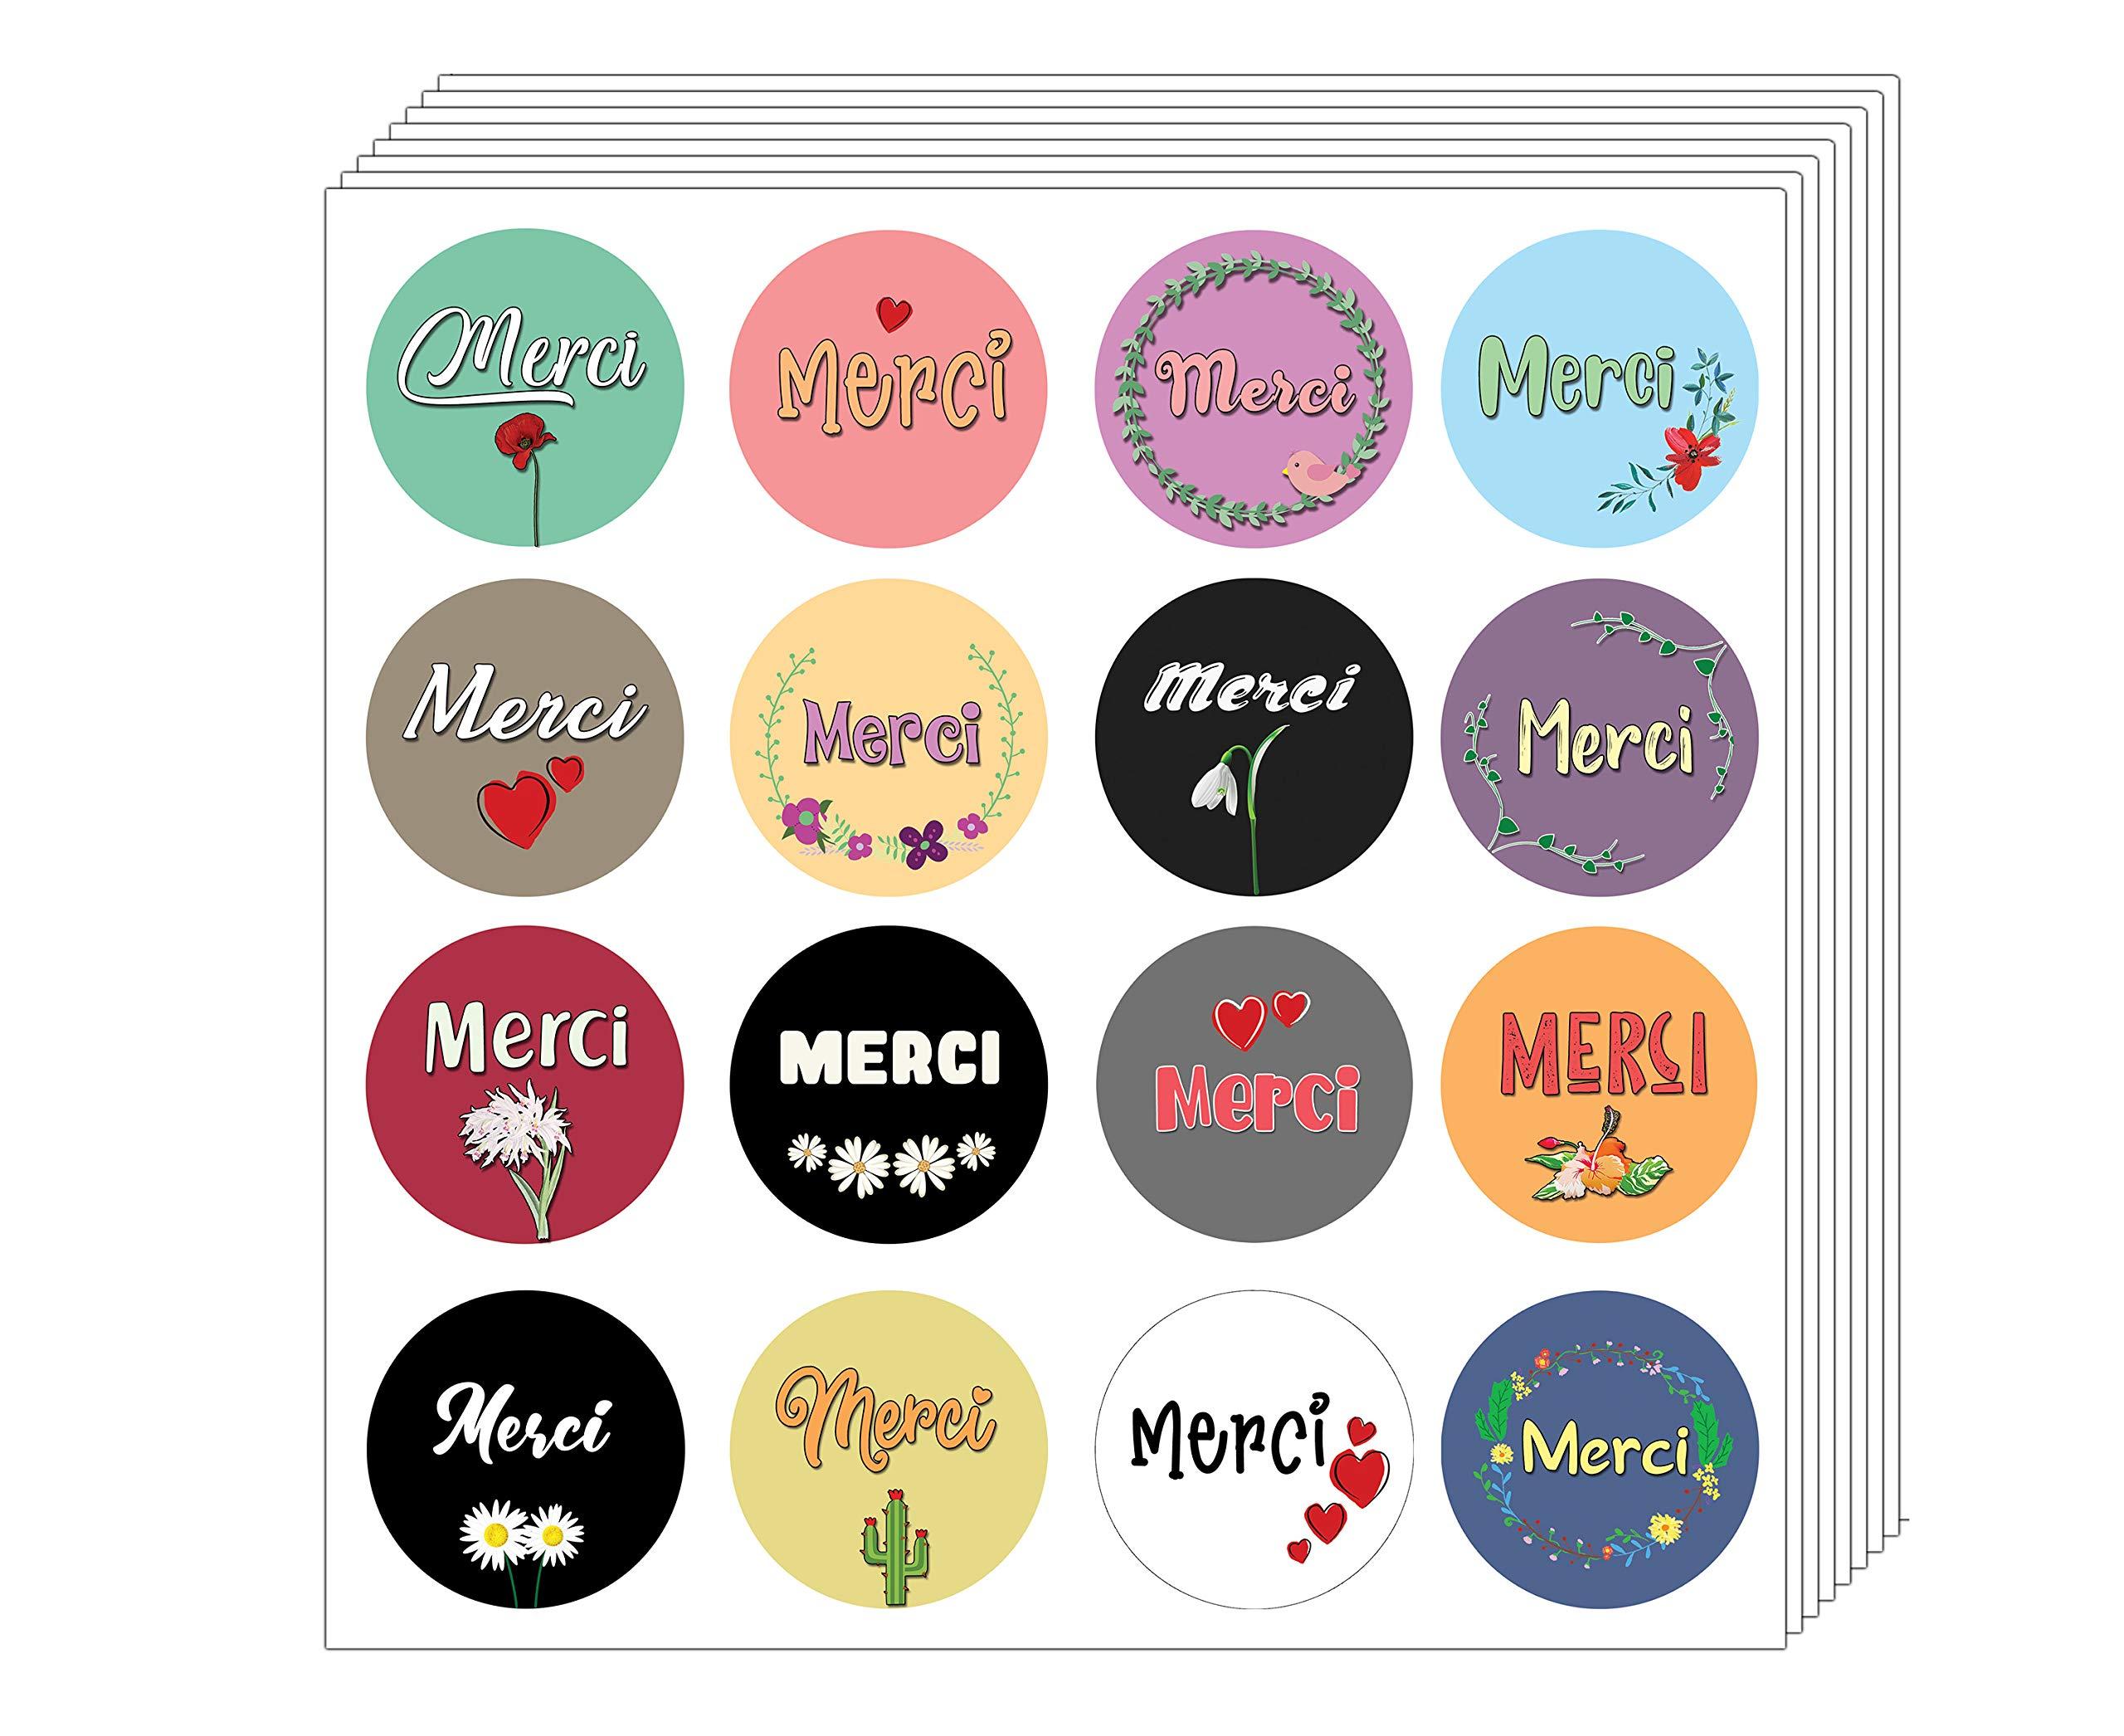 Creanoso Merci Stickers (5-Sheet) - Premium Quality Assorted Design - Stocking Stuffers Perfect Gift Idea Set for Girls, Boys, Men, Women